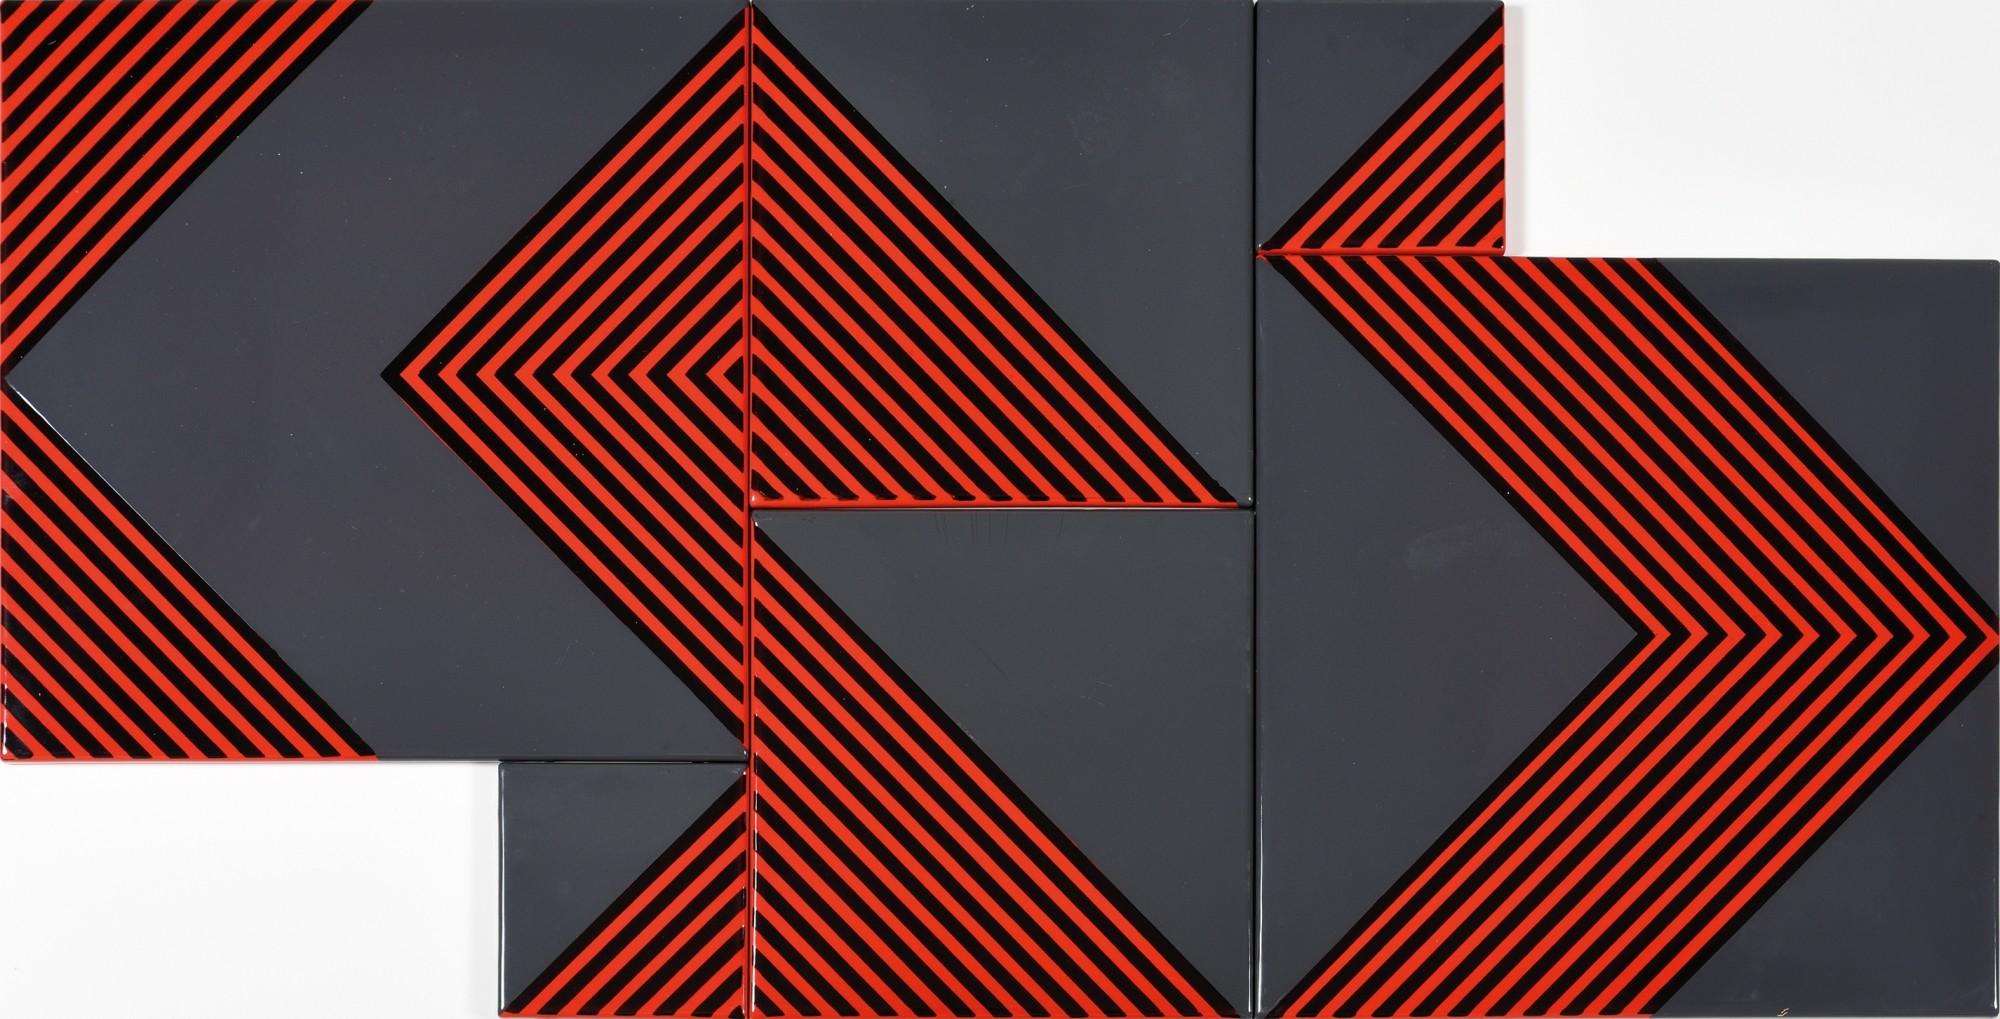 "<span class=""link fancybox-details-link""><a href=""/artists/213-kalman-szijarto/works/10787/"">View Detail Page</a></span><div class=""artist""><span class=""artist""><strong>KÁLMÁN SZIJÁRTÓ</strong></span></div><div class=""title""><em>Untitled (Grey-Red)</em>, 1970</div><div class=""medium"">Enamel on iron plate</div><div class=""dimensions"">60 x 120 cm<br /> 23 ½ x 47 ¼ inches</div>"